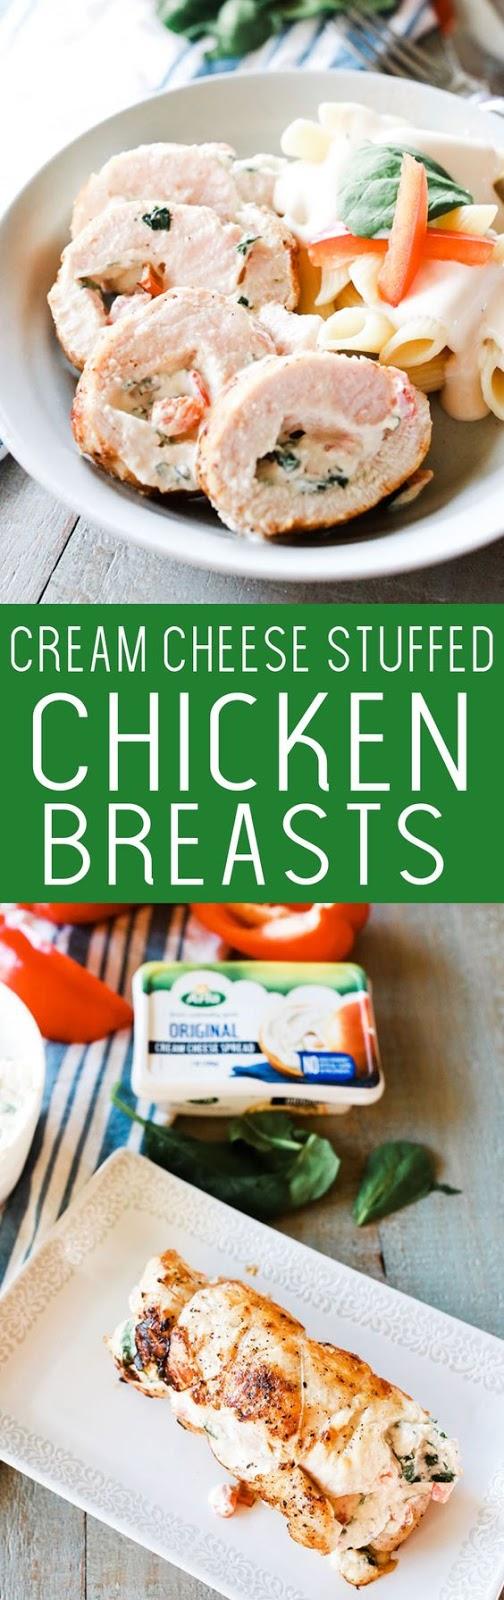 Cream Cheese Stuffed Chicken Breasts